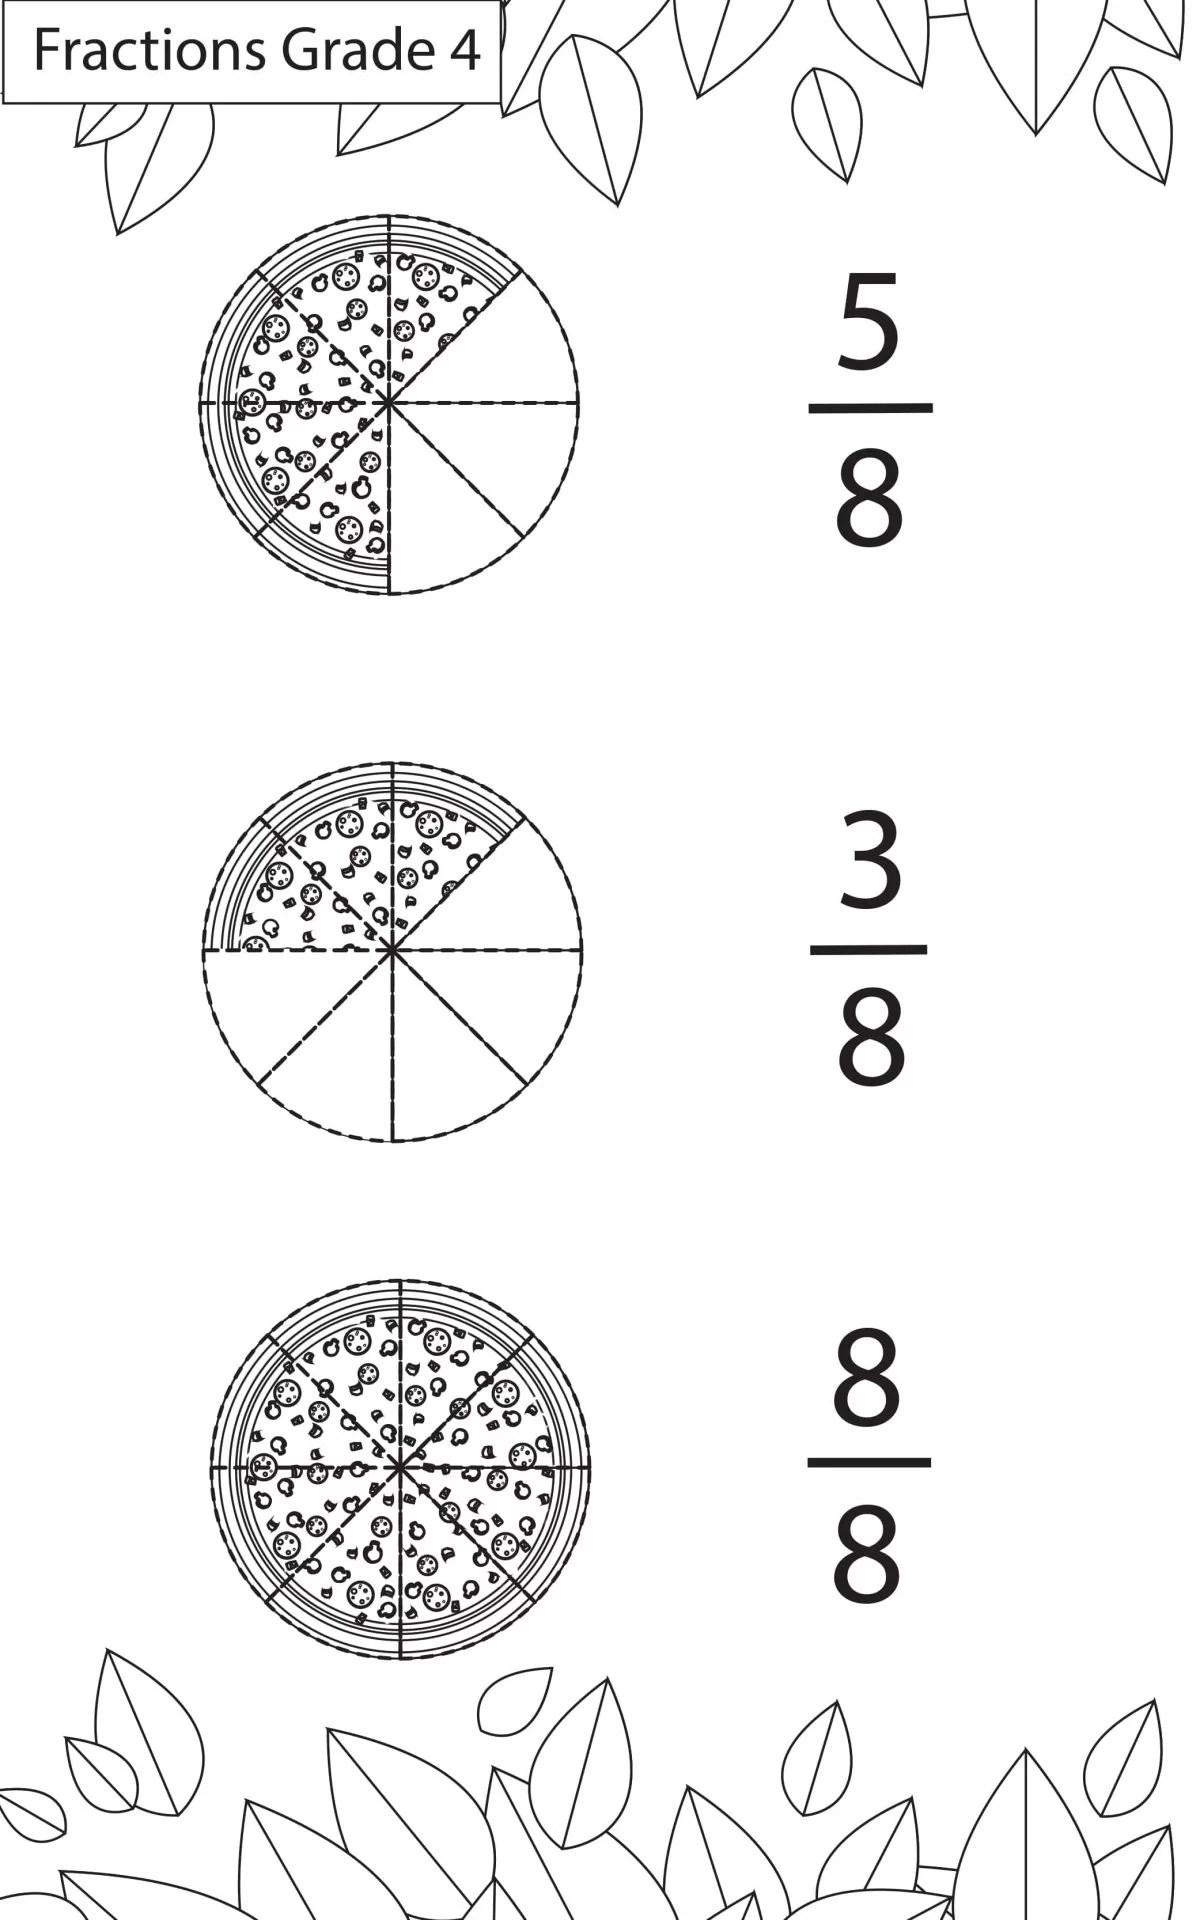 Maths Worksheets Grade 4 Fractions